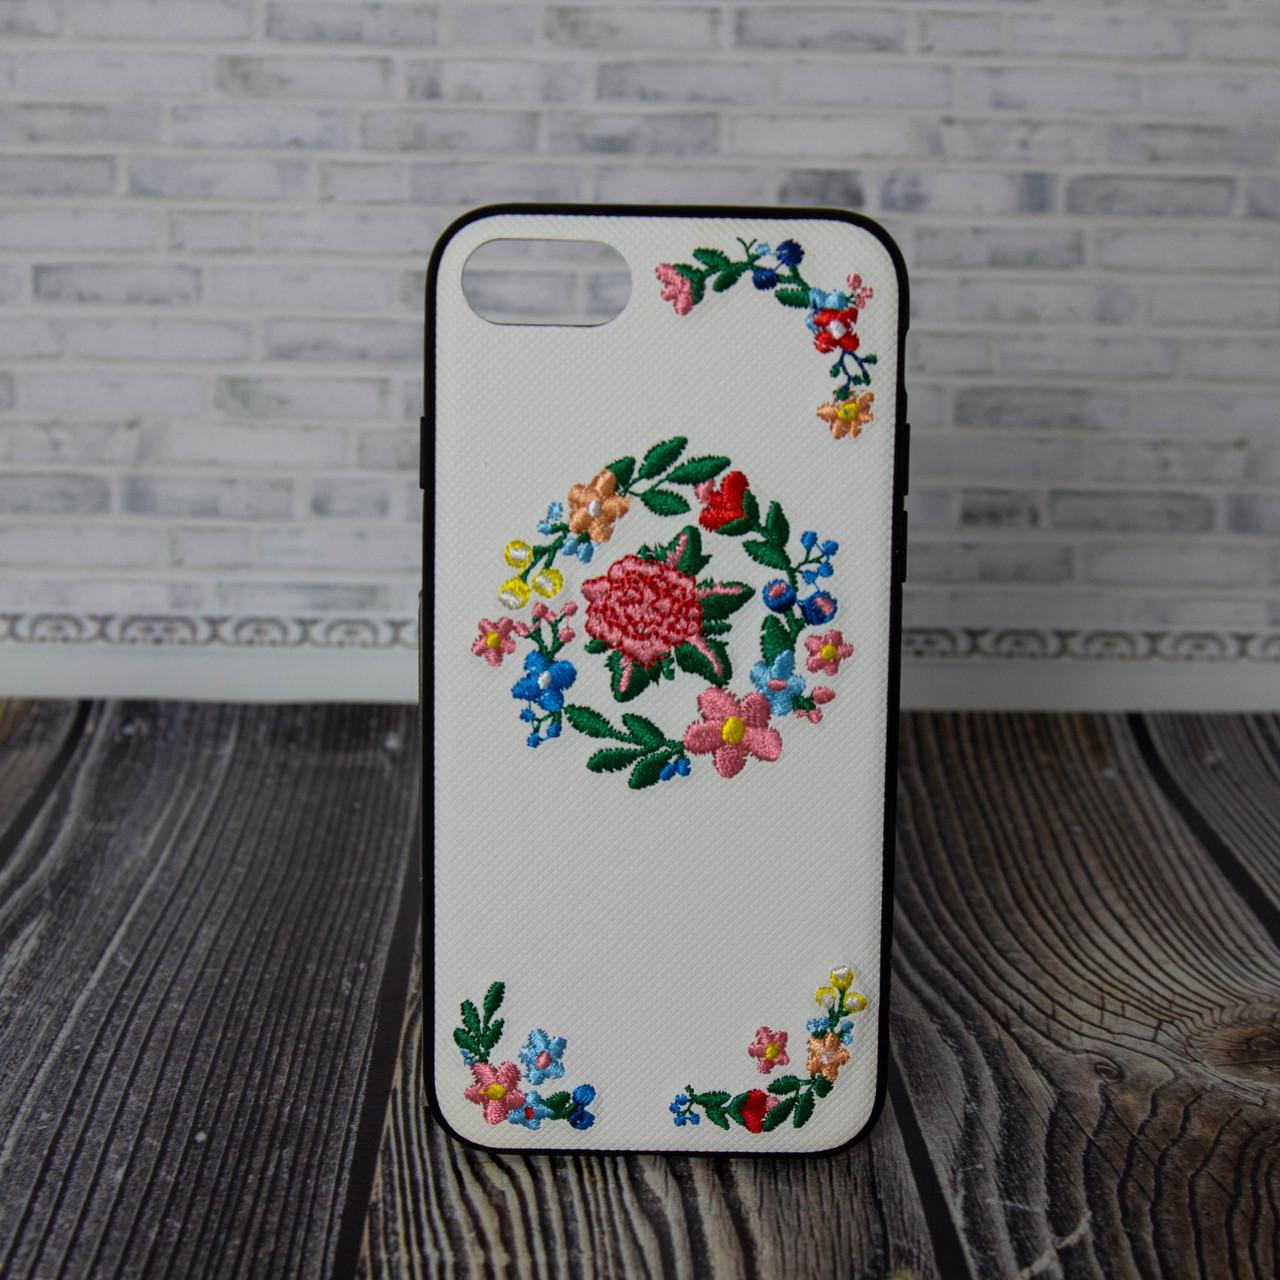 Чехол накладка для Iphone 7 8 Hoco summer flowers вышиванка пион